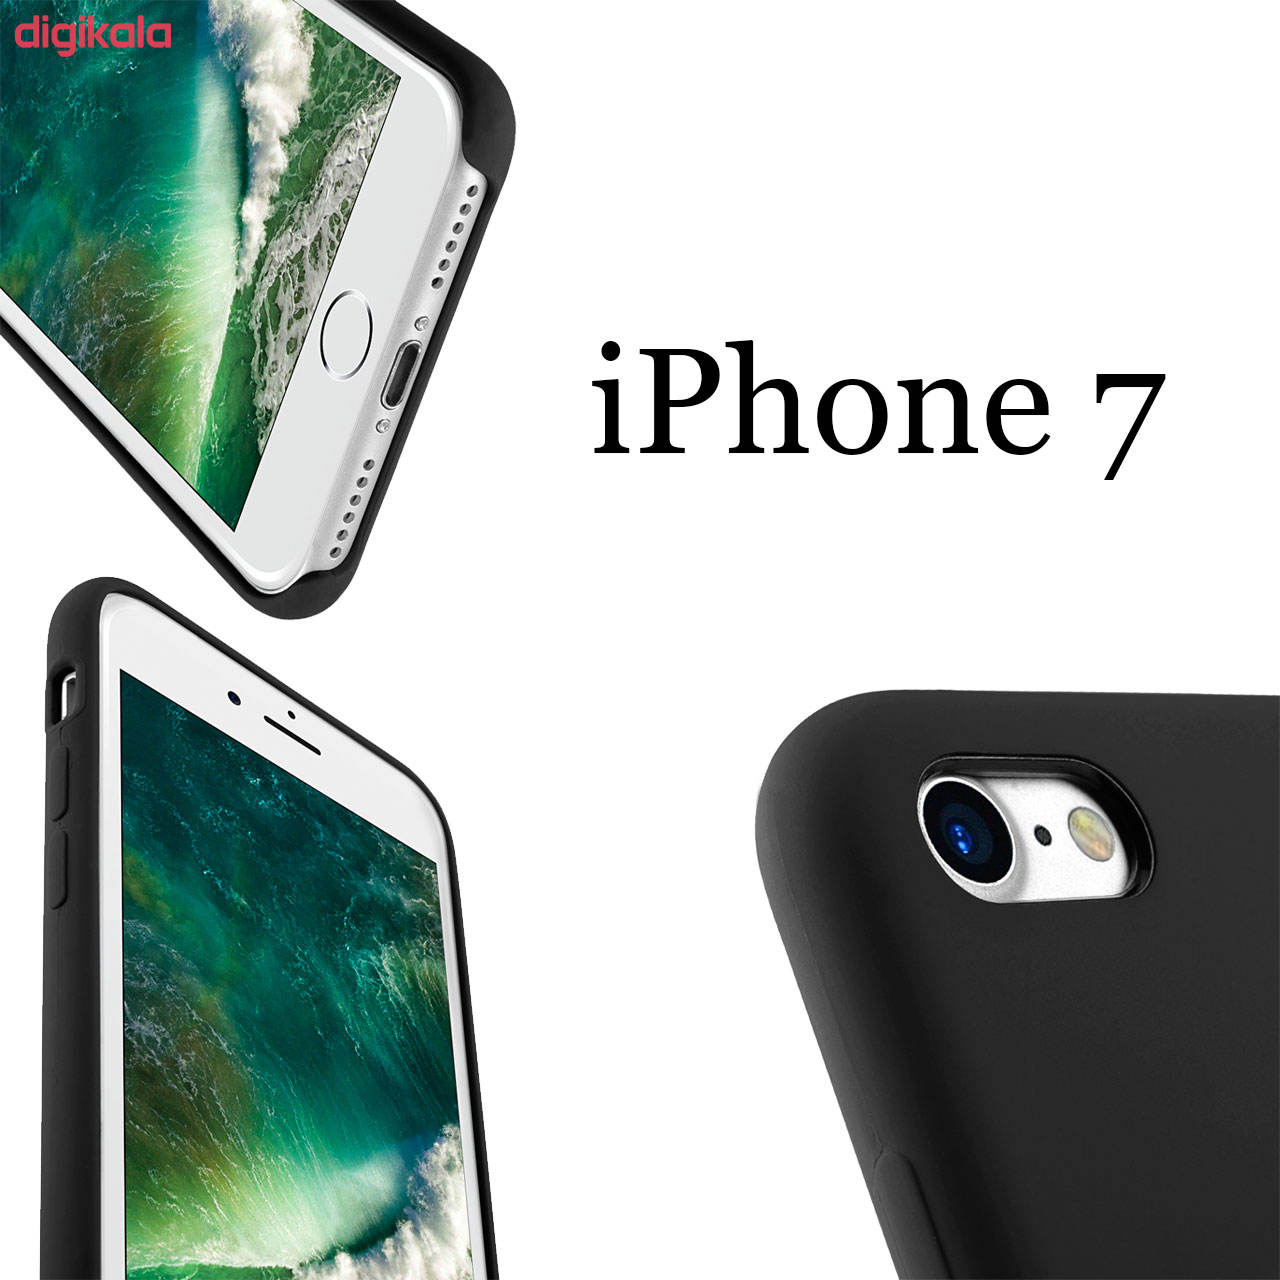 کاور مدل SLCN مناسب برای گوشی موبایل اپل iPhone 7 main 1 9